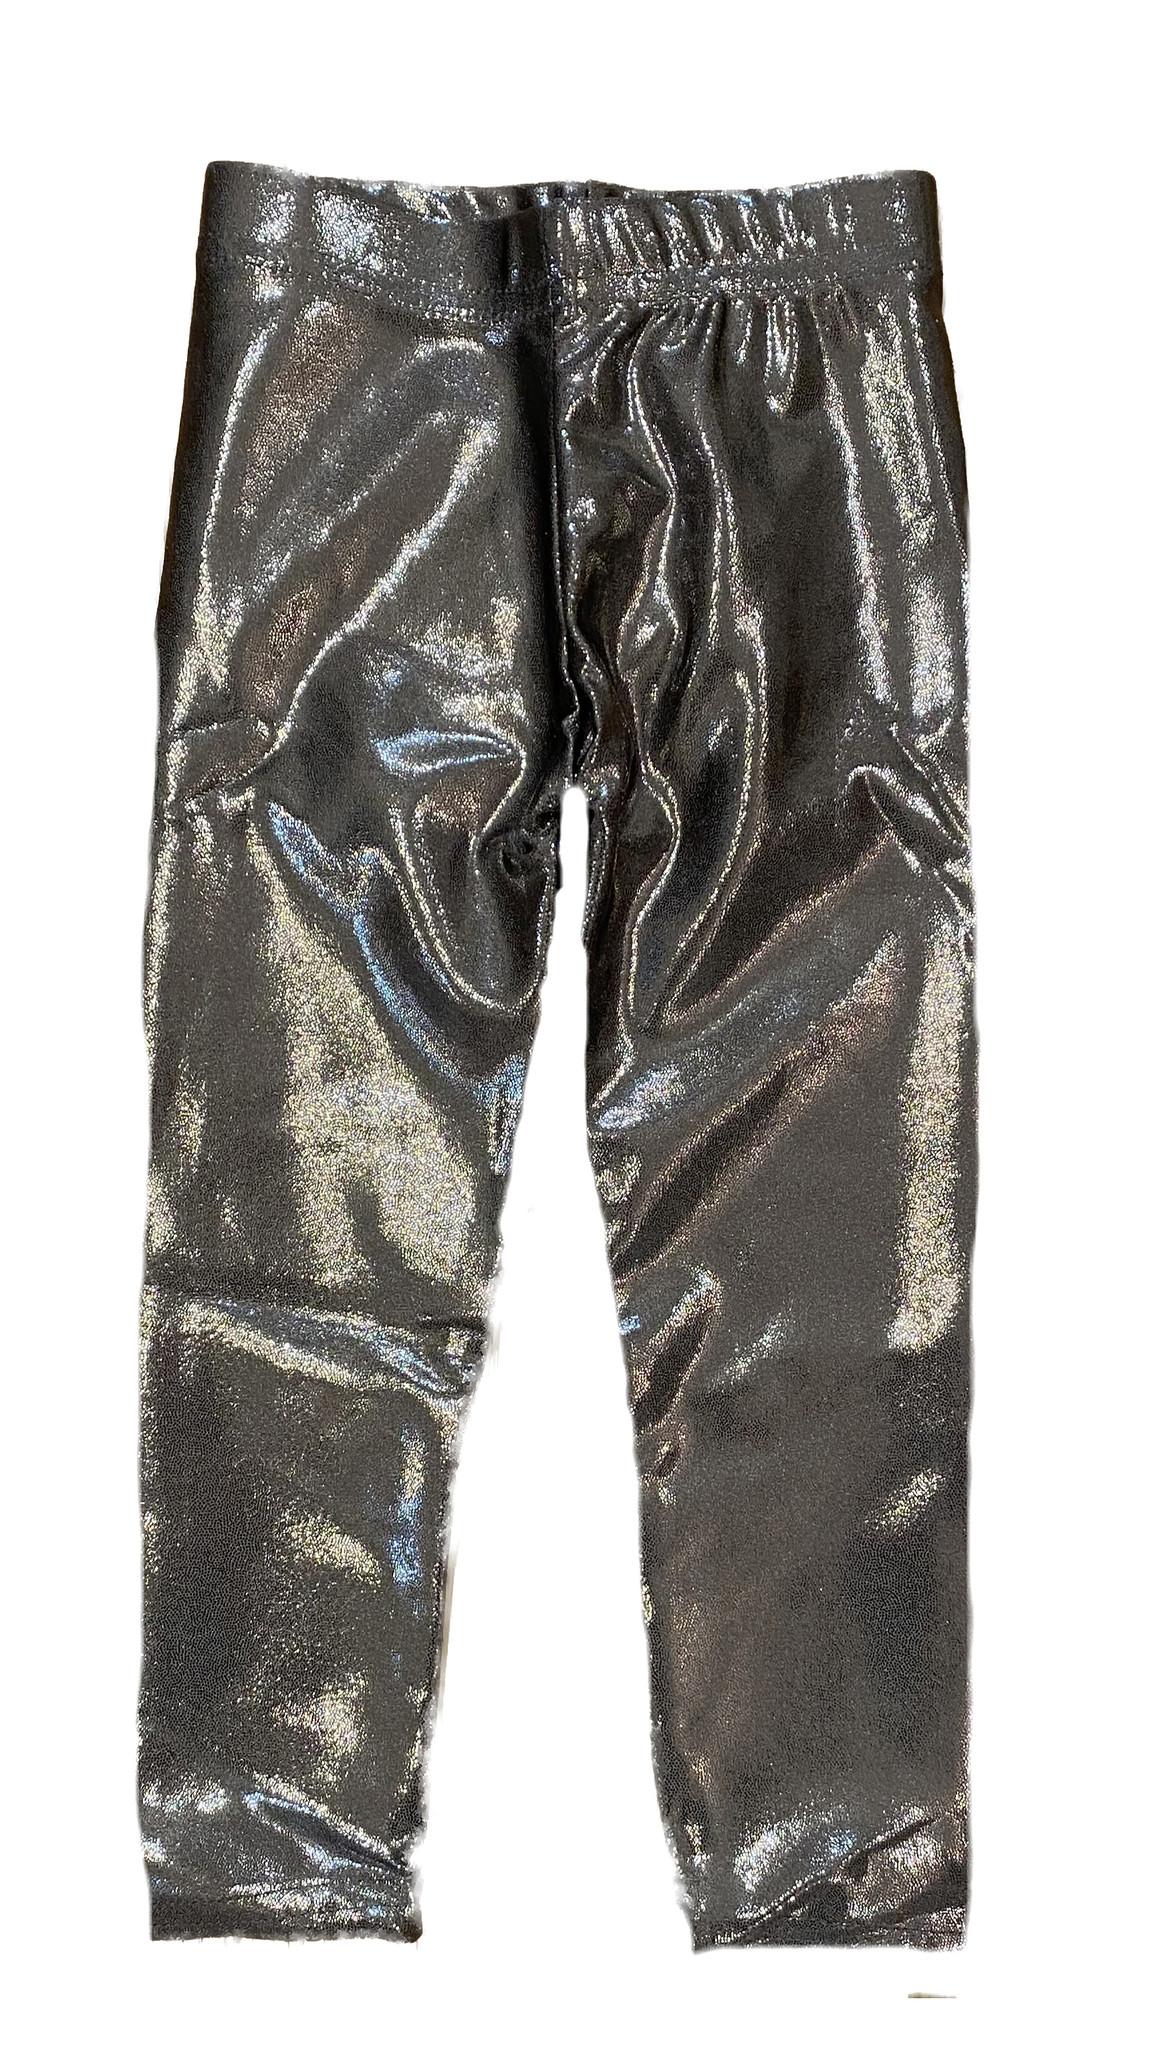 Dori Charcoal Lame Infant Legging